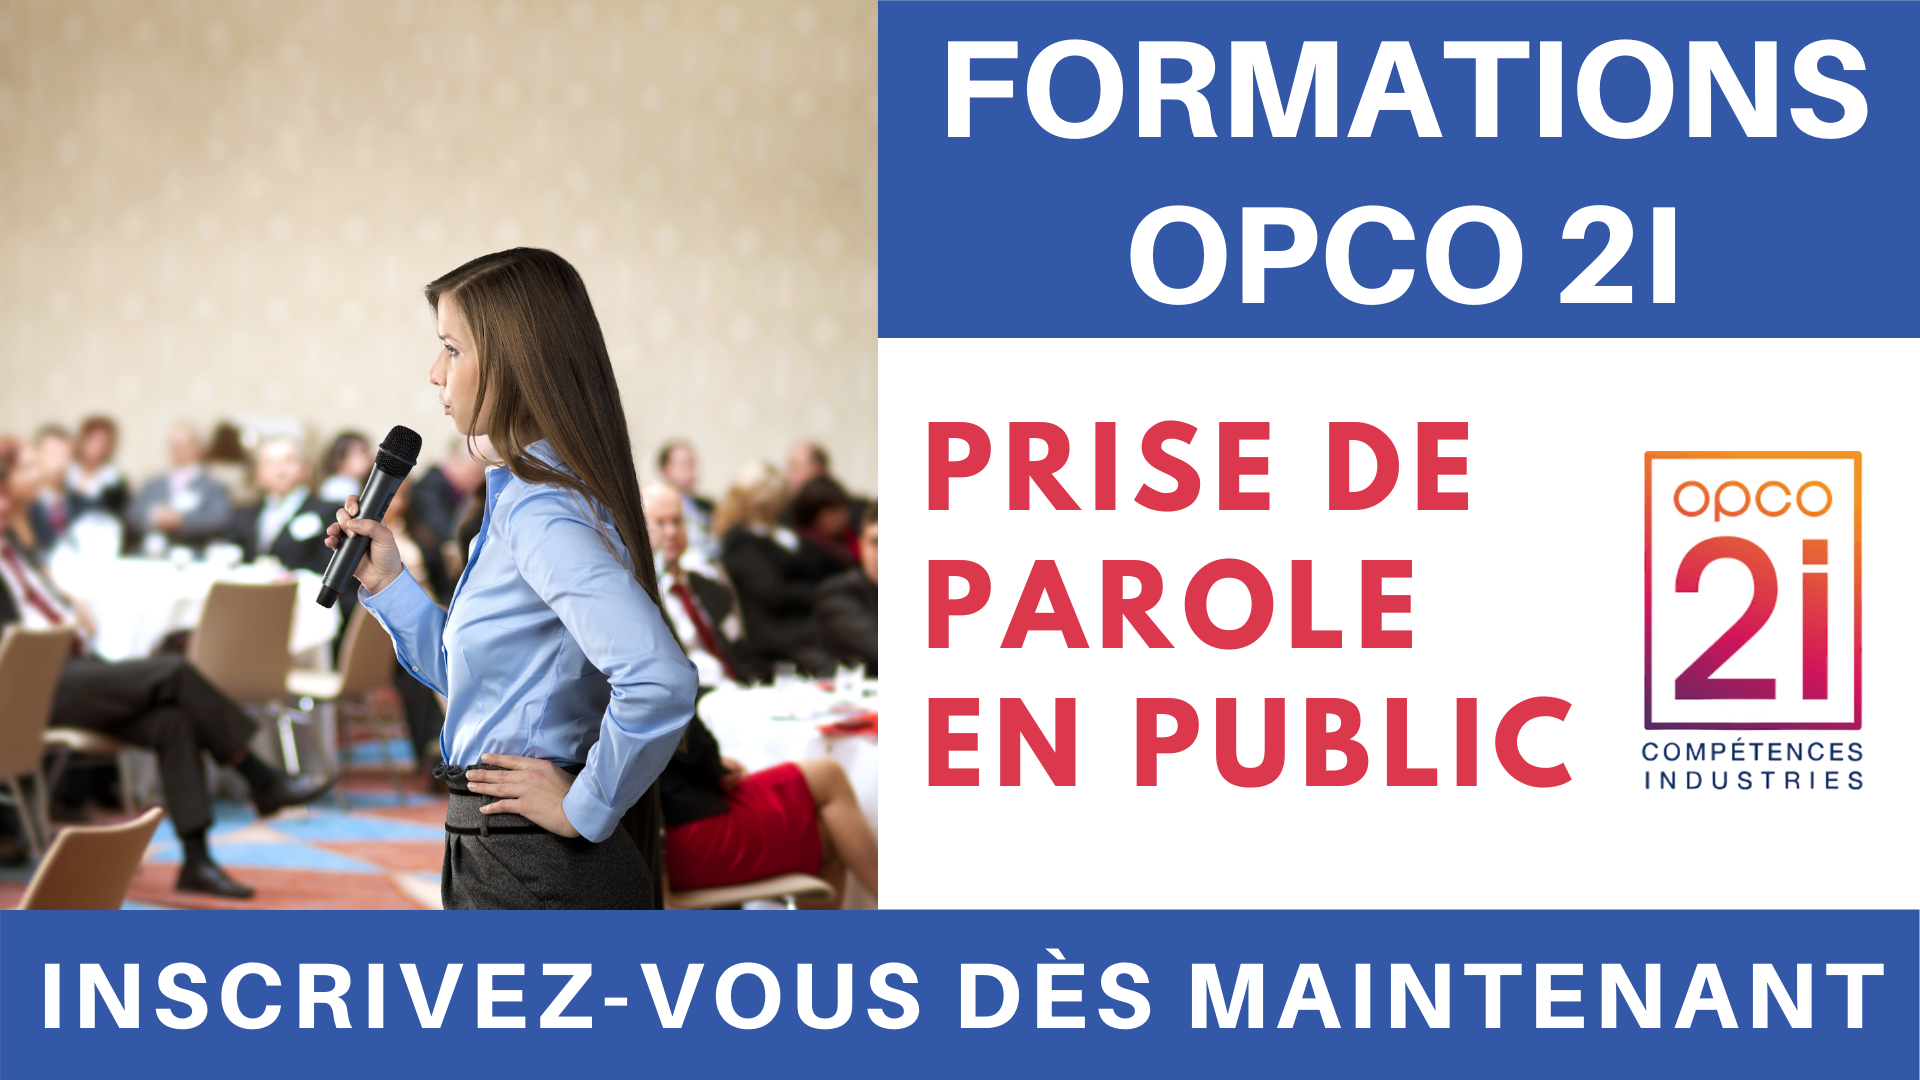 Pub Formations OPCO 2i - Prise de parole en public